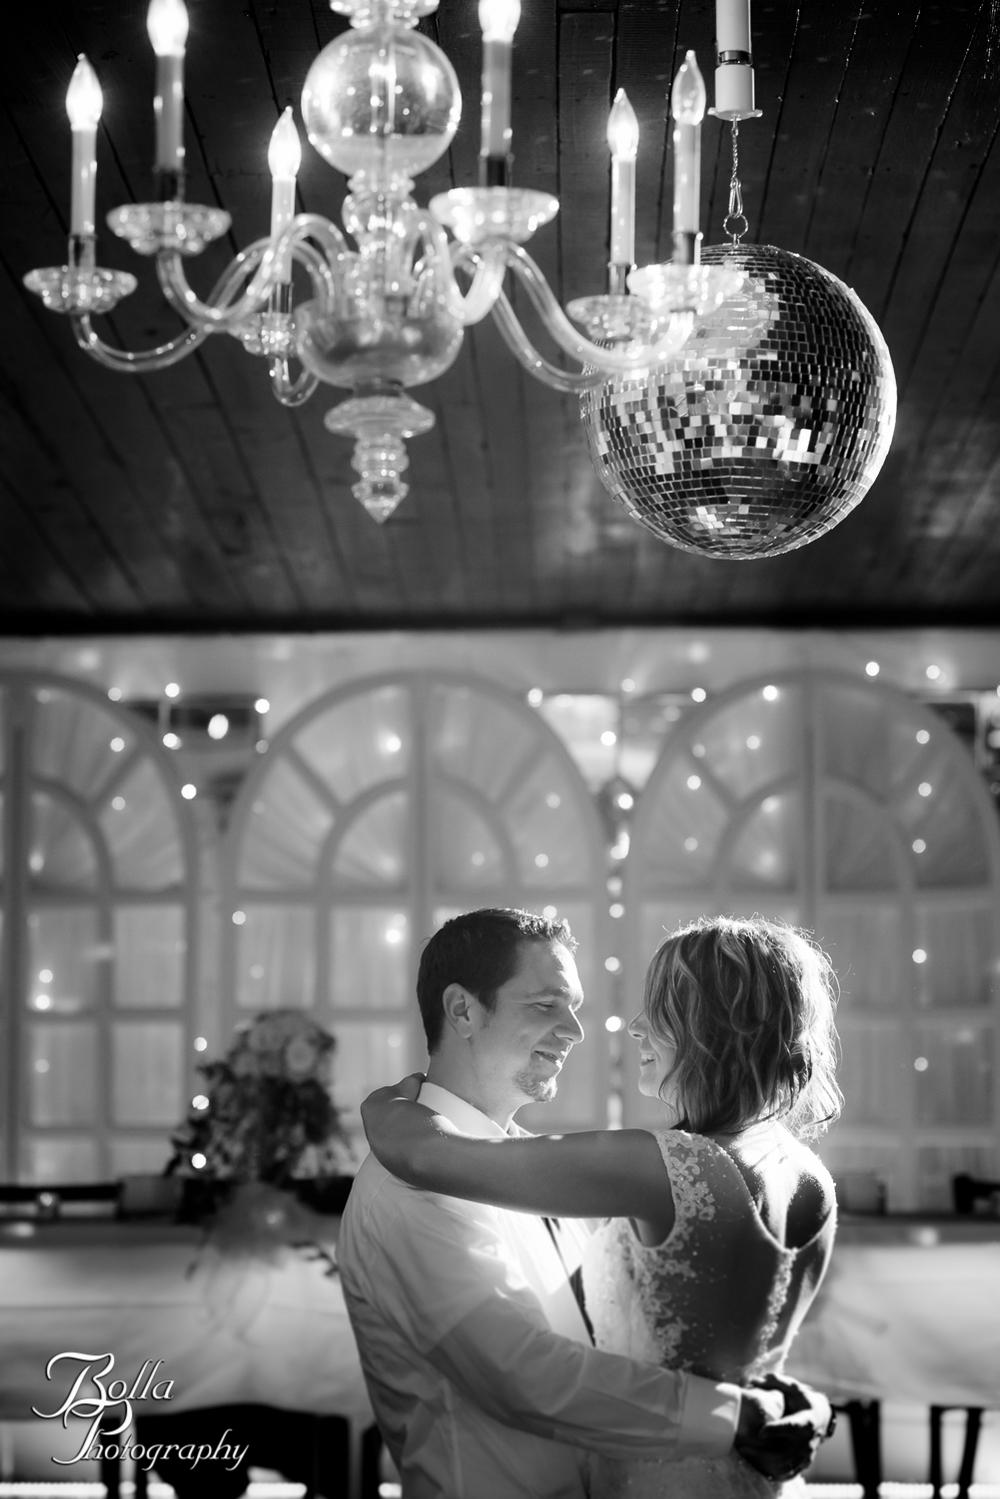 Bolla_Photography_St_Louis_wedding_photographer-0512.jpg